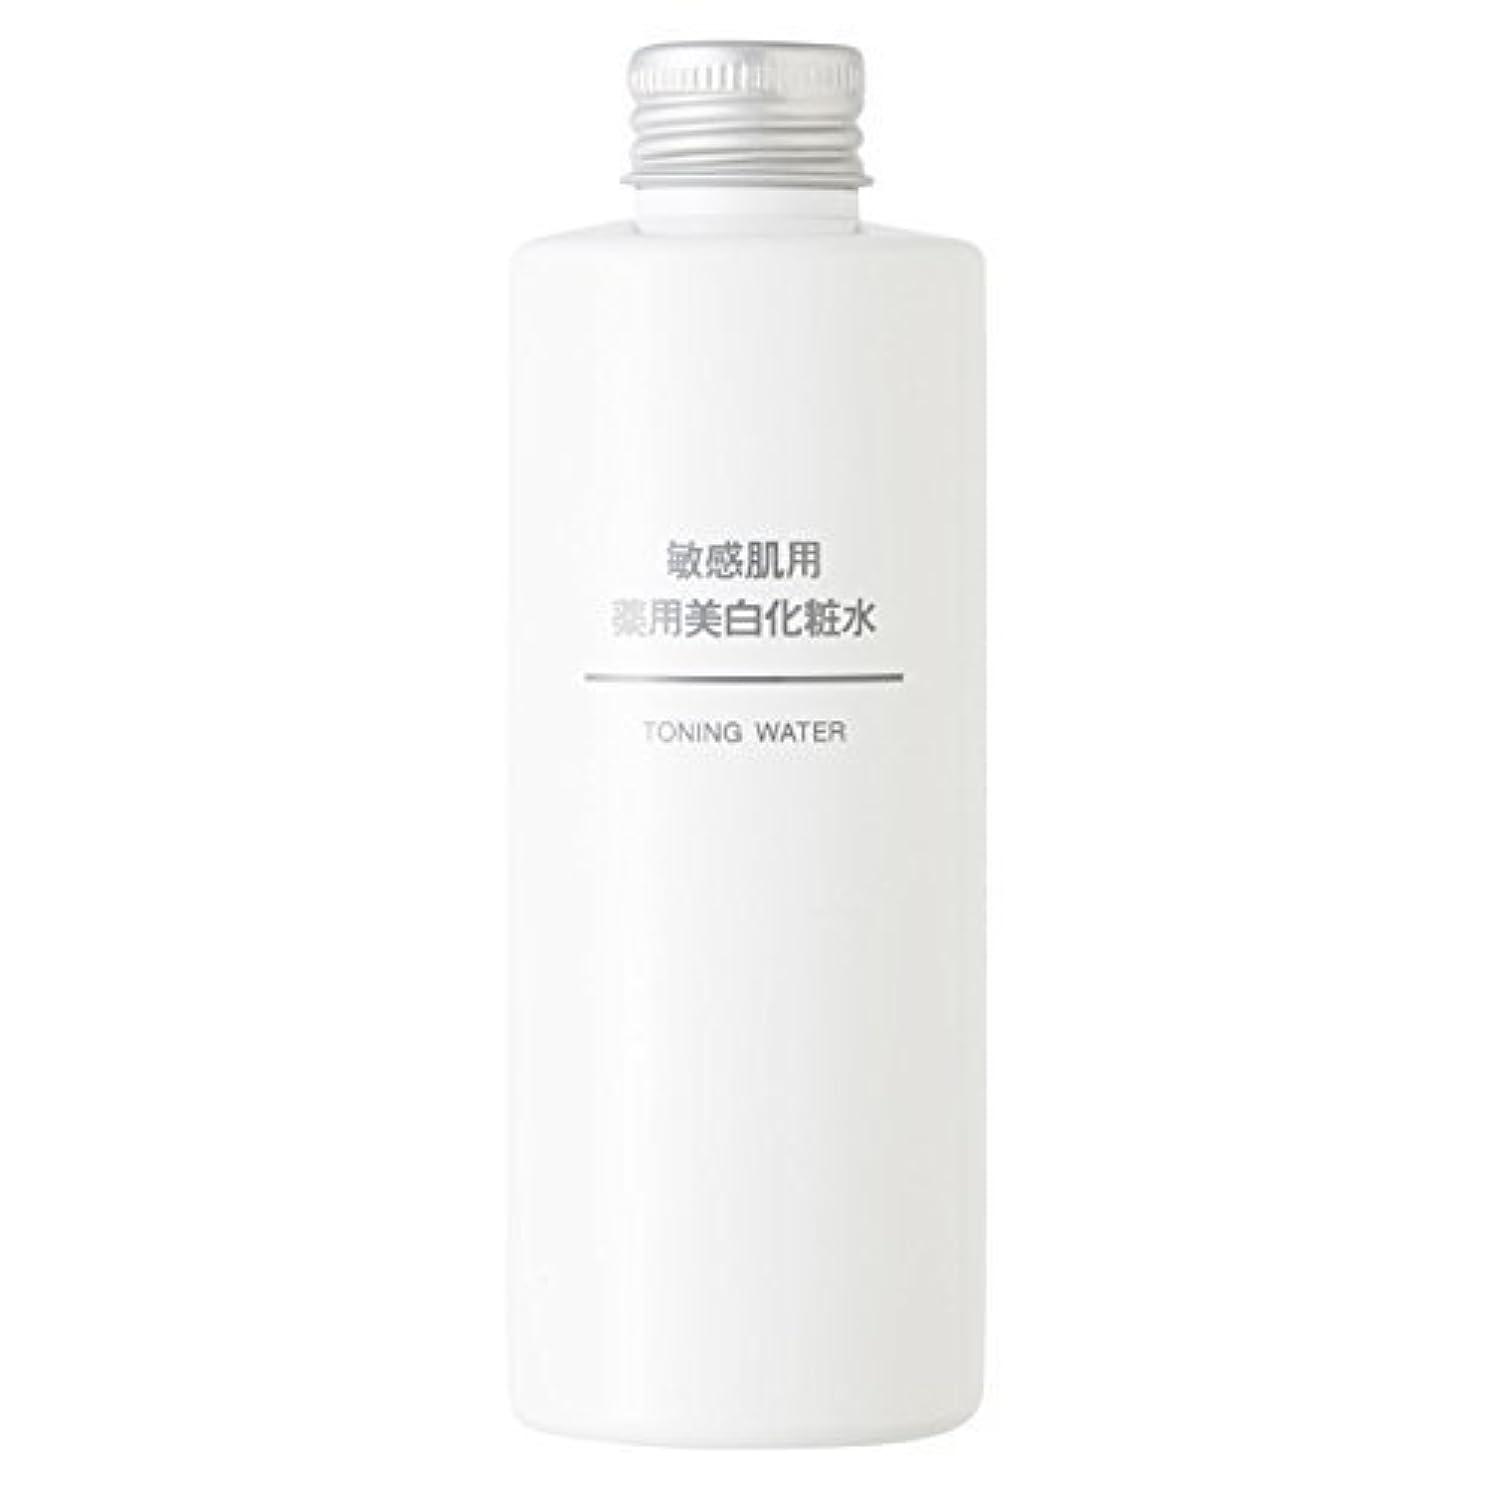 古い侵入する糸無印良品 敏感肌用 薬用美白化粧水 (新)200ml